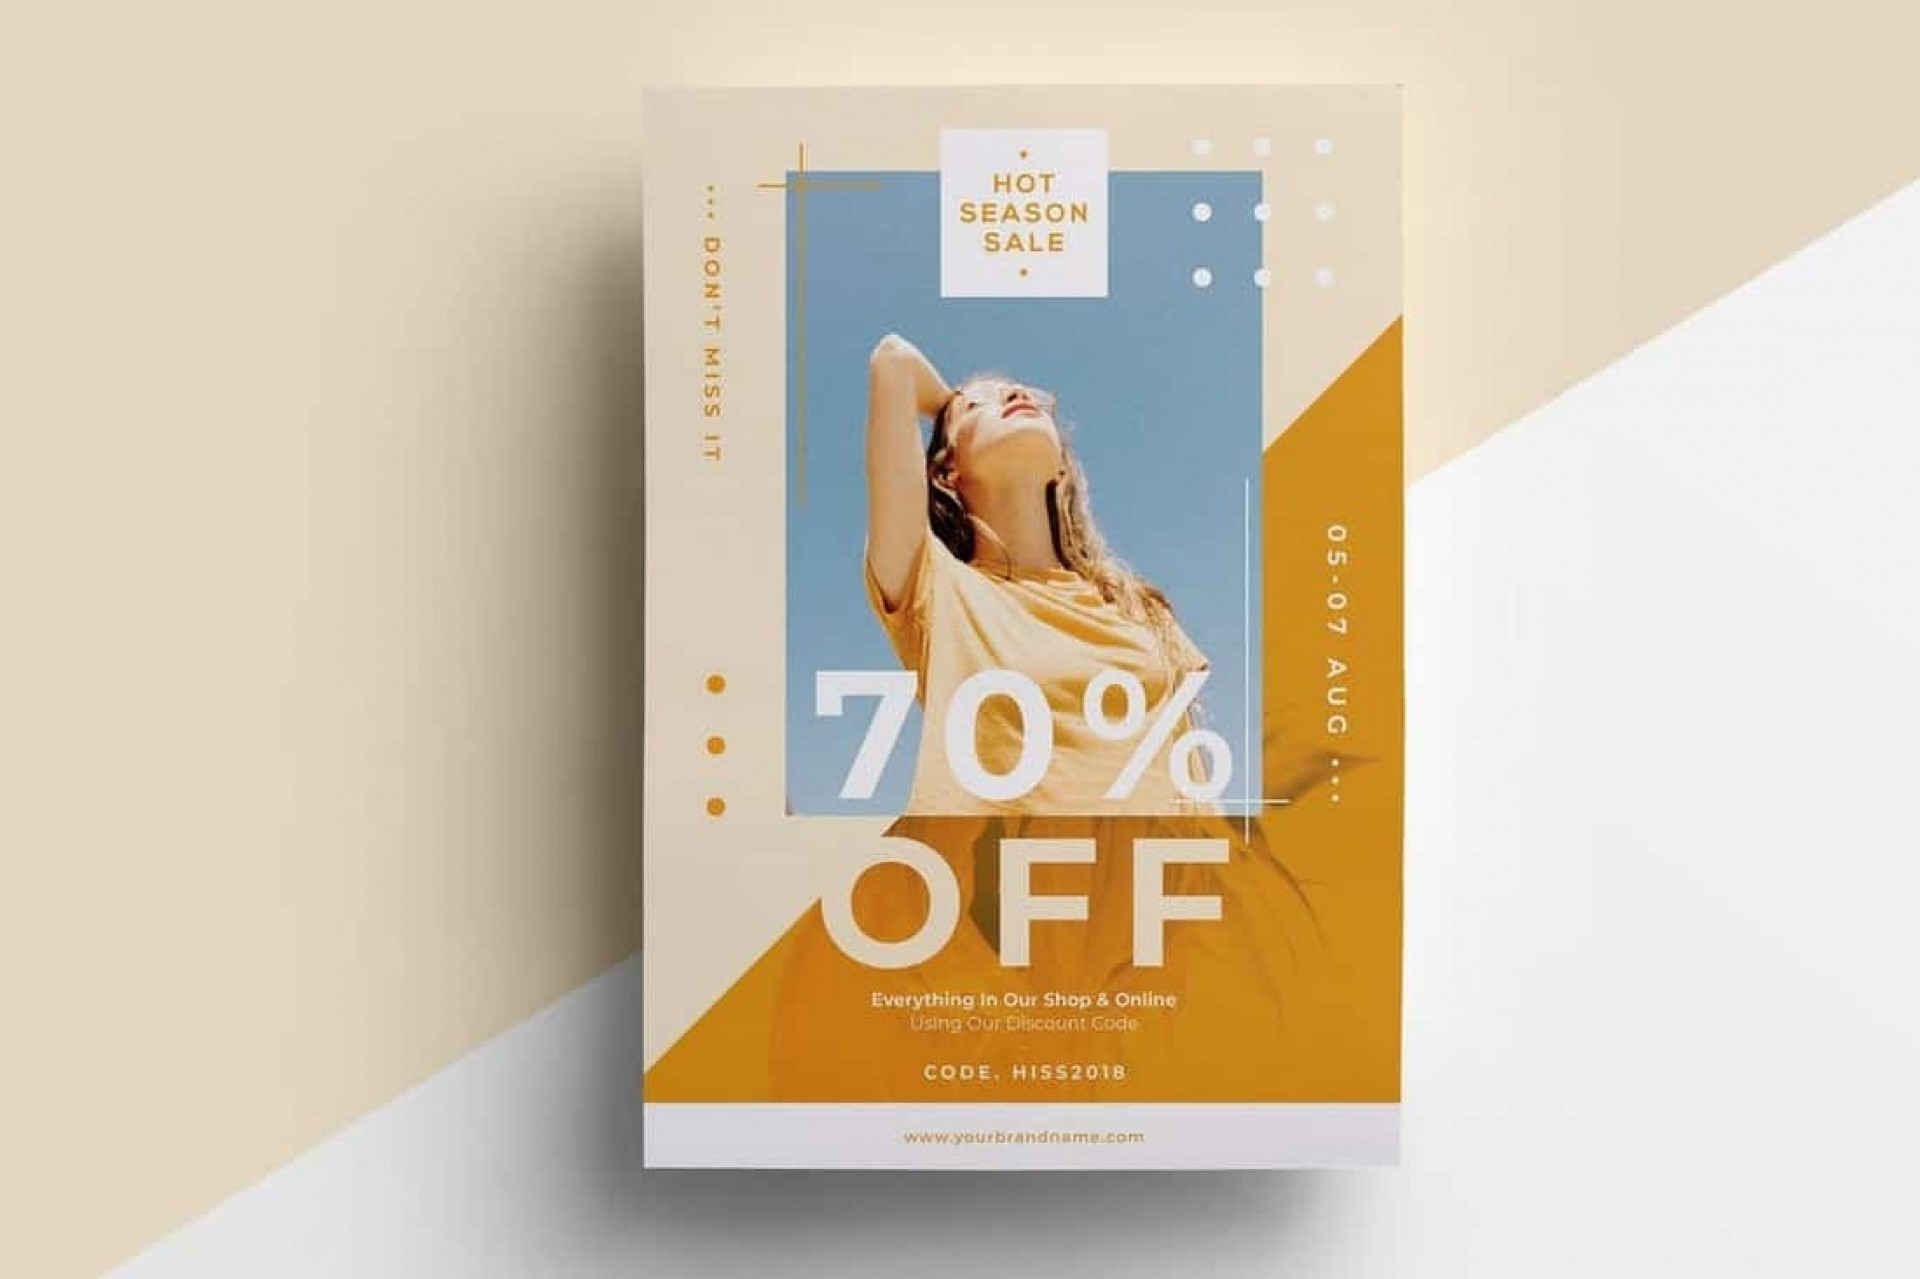 004 Sensational In Design Flyer Template Photo  Indesign Free Adobe Download1920